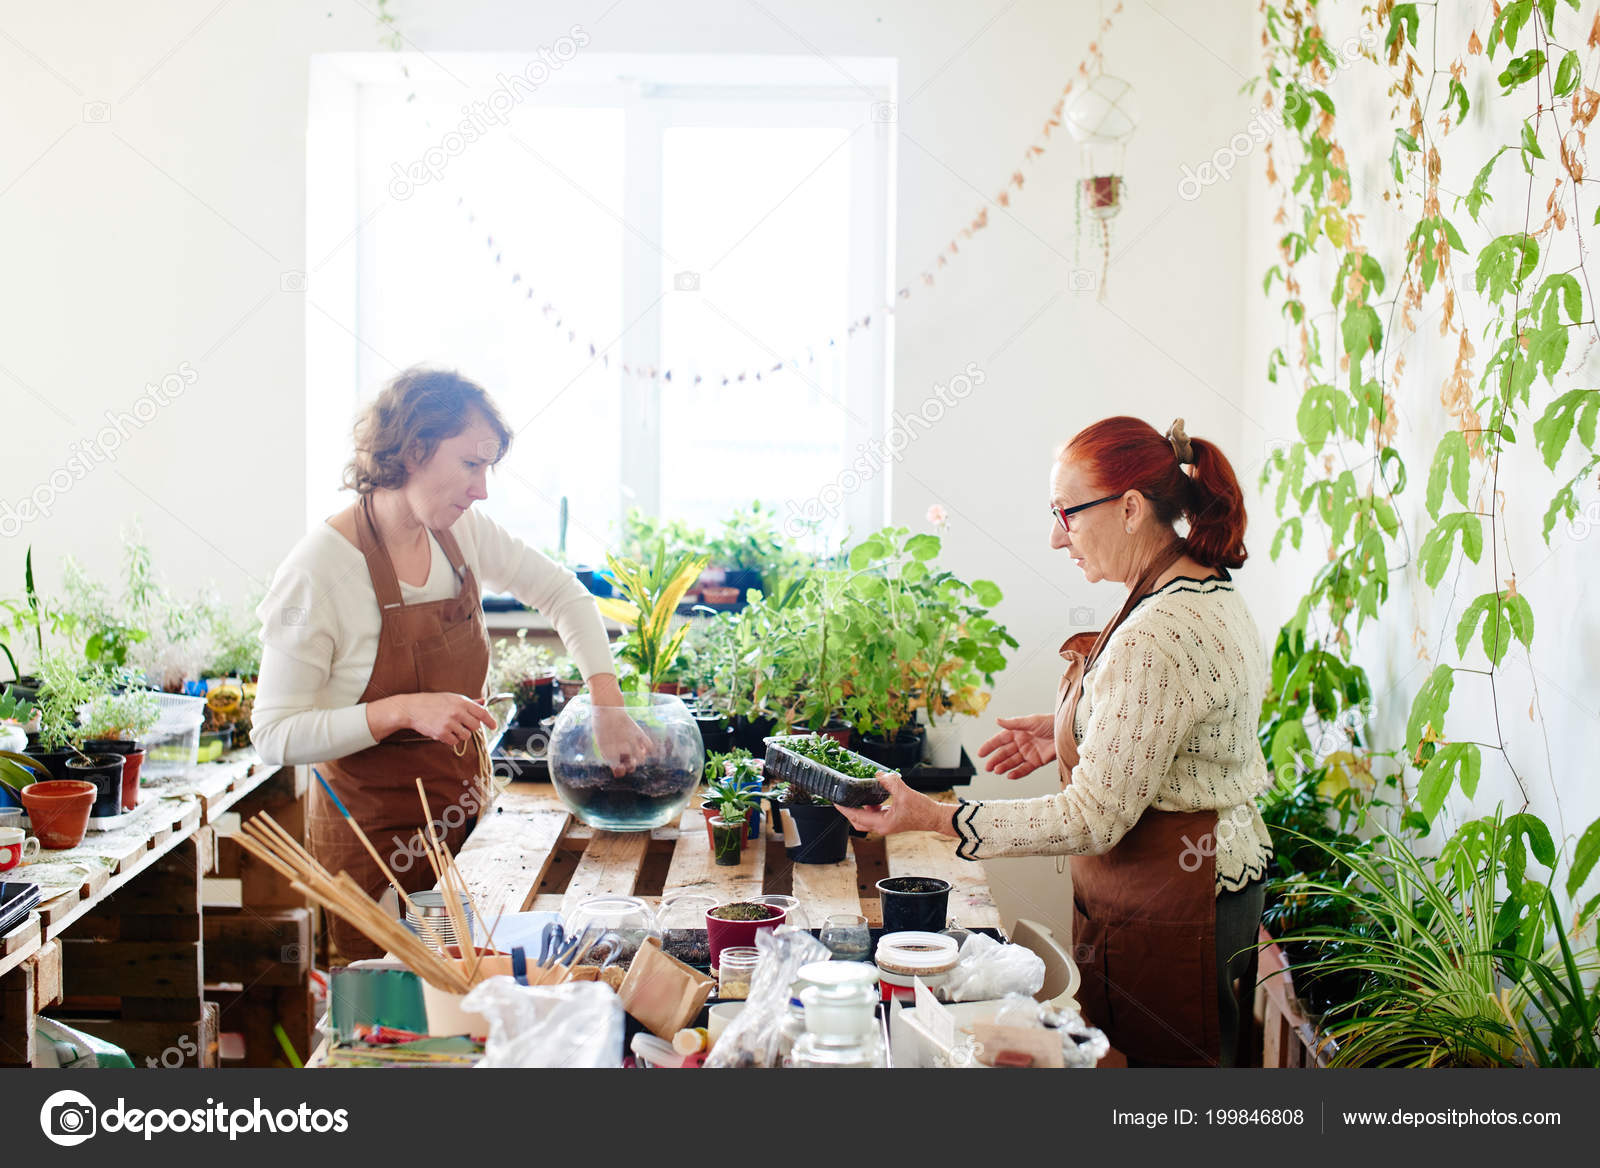 Growers Making Mini Terrarium Plants Sunlit Room Stock Photo